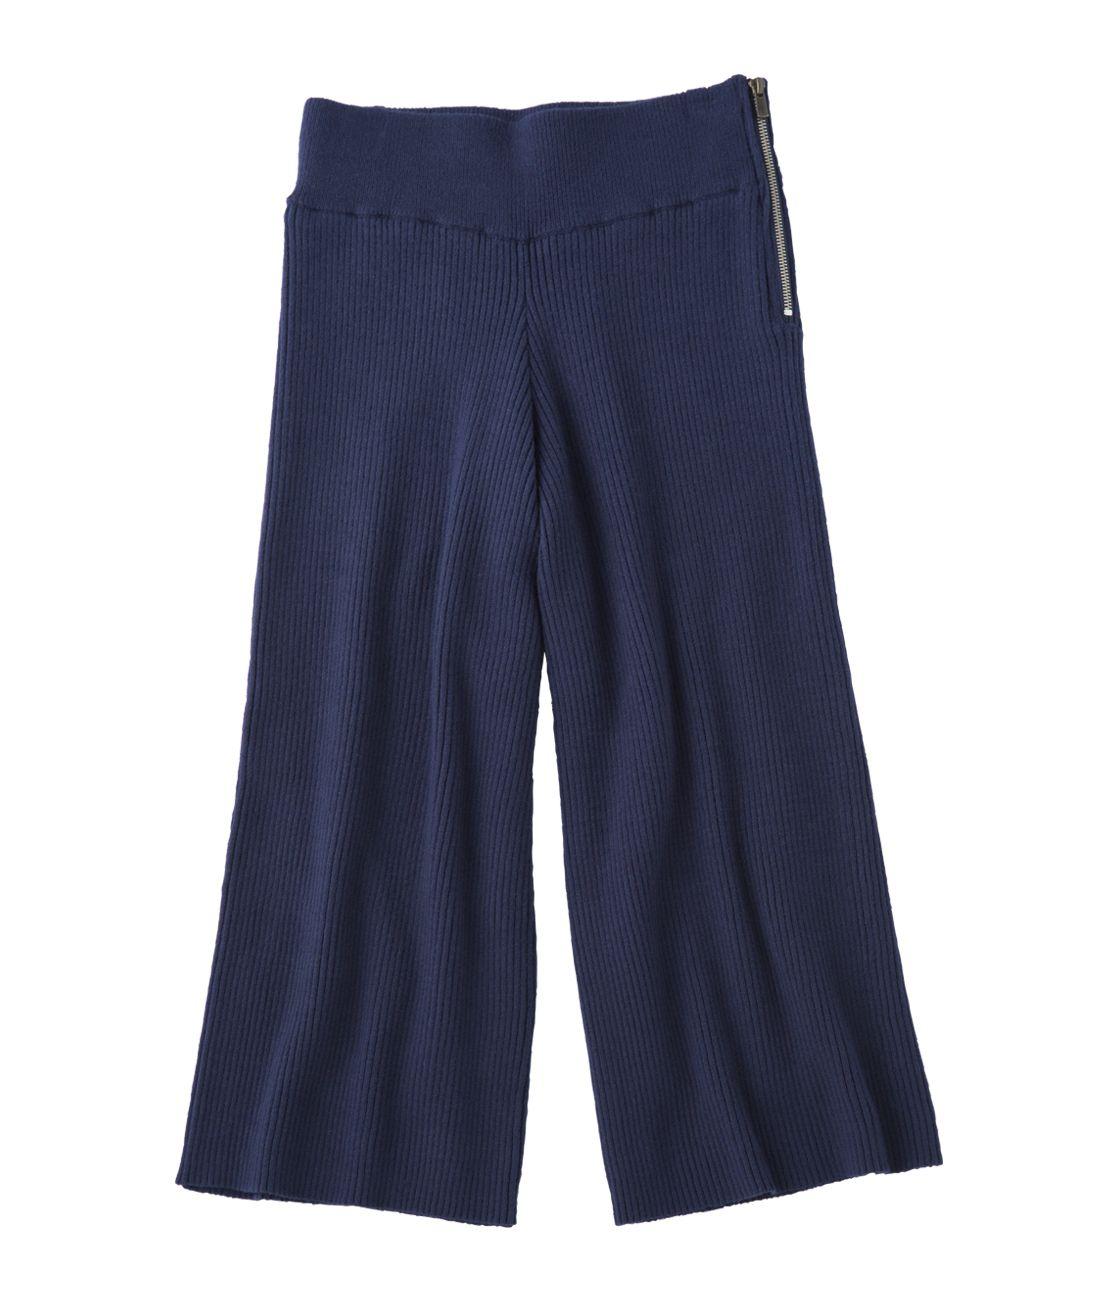 Wide rib knit gaucho pants